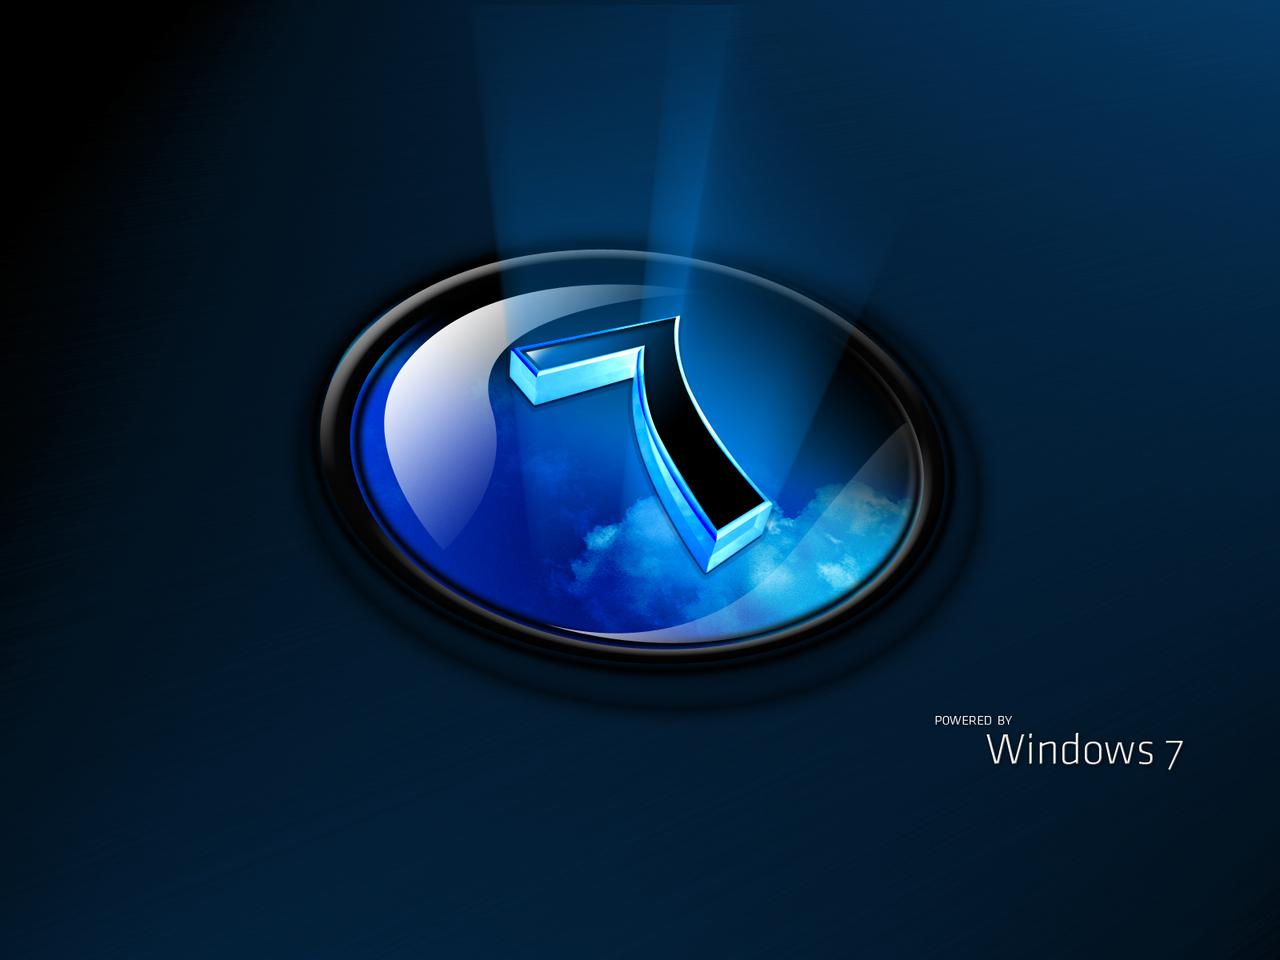 Live Screensavers For Windows 7 1280x960